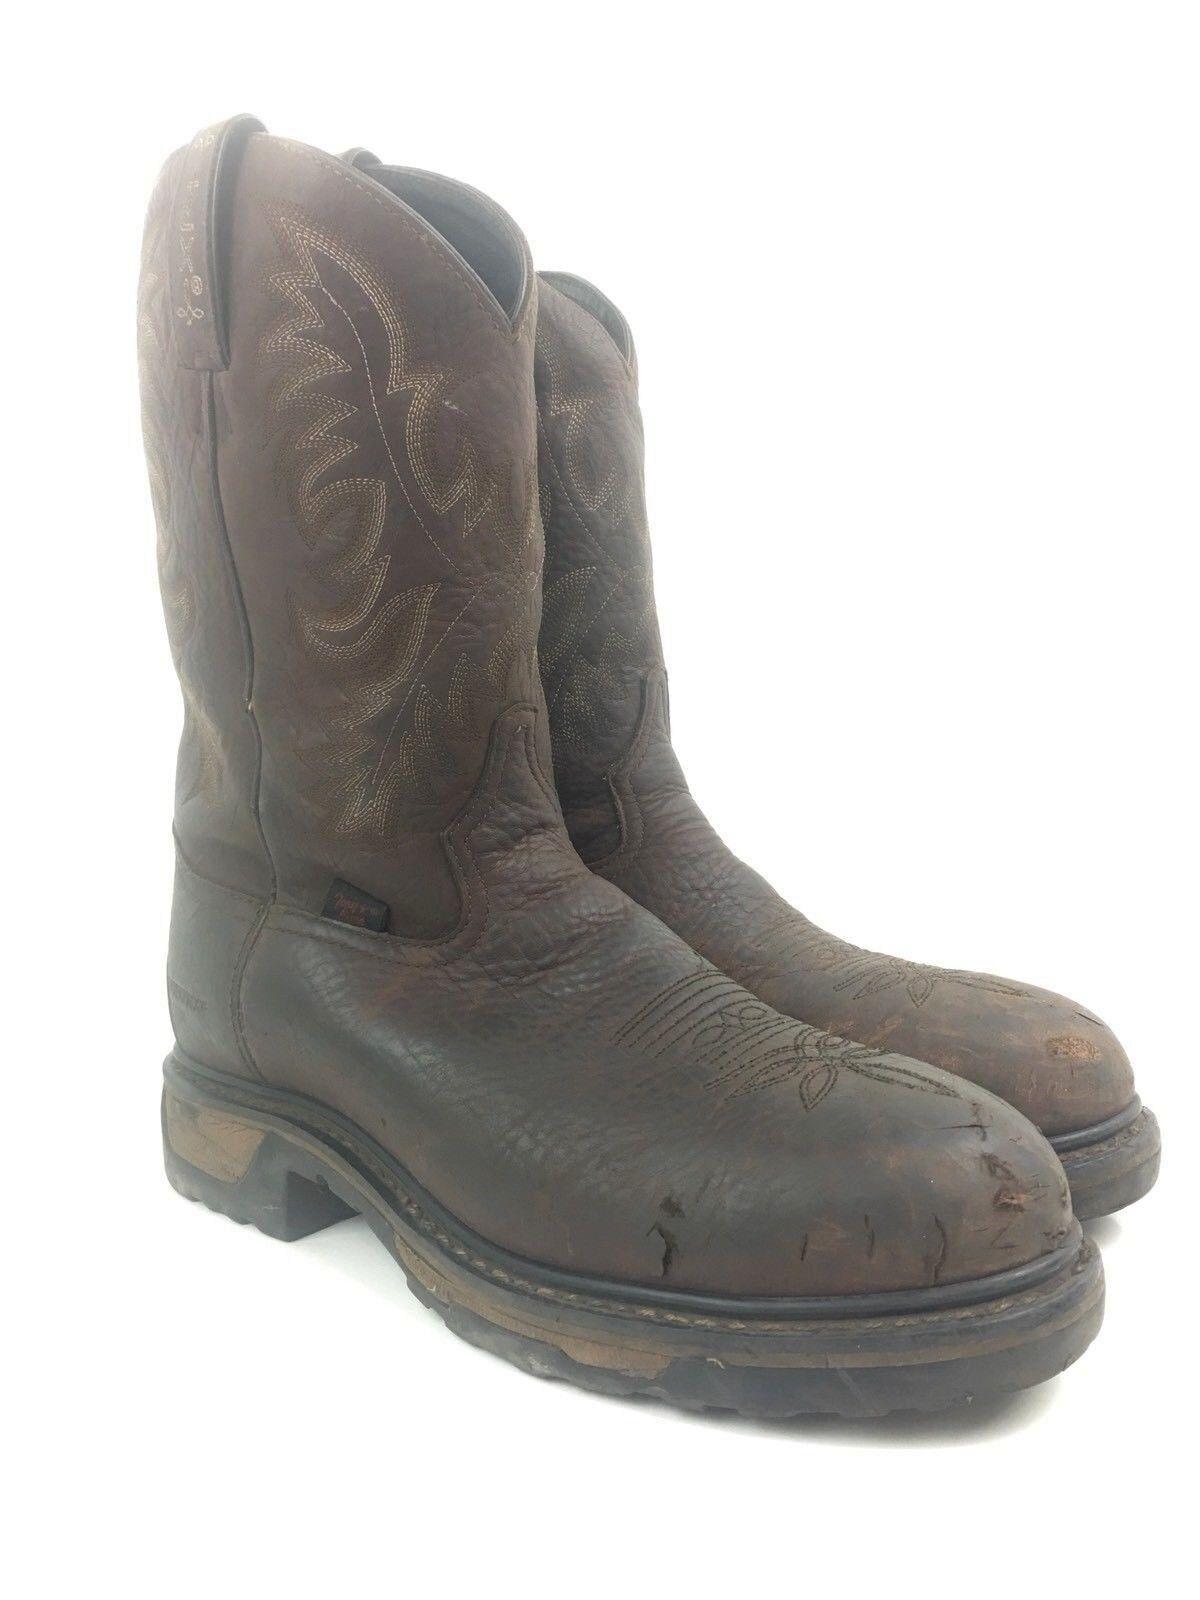 Tony Lama Mens US Sz 9.5D Brown Embroidered Waterproof Steel Toe Cowboy Boots